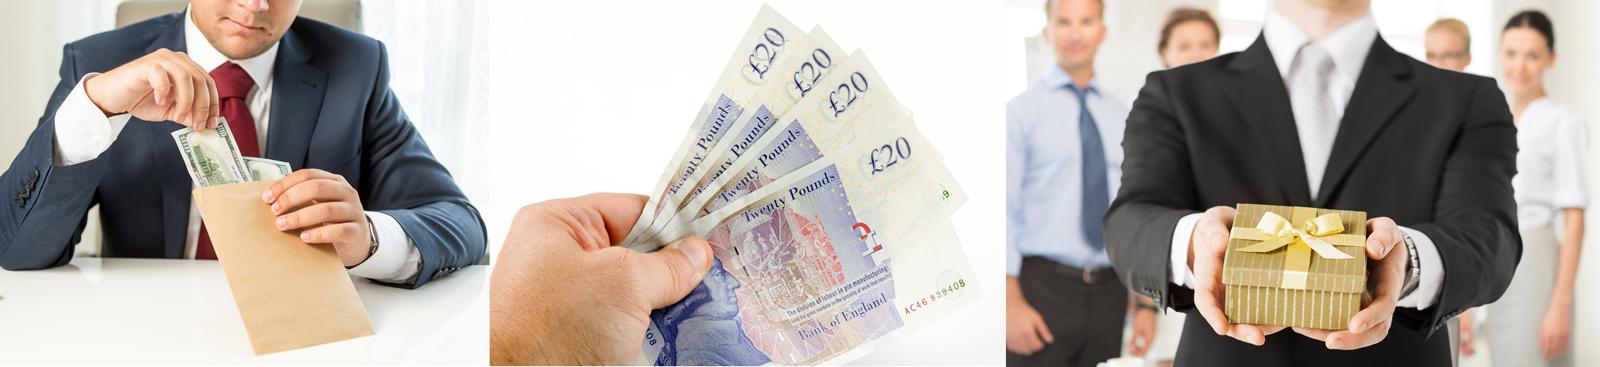 Anti-Bribery Expert Insight